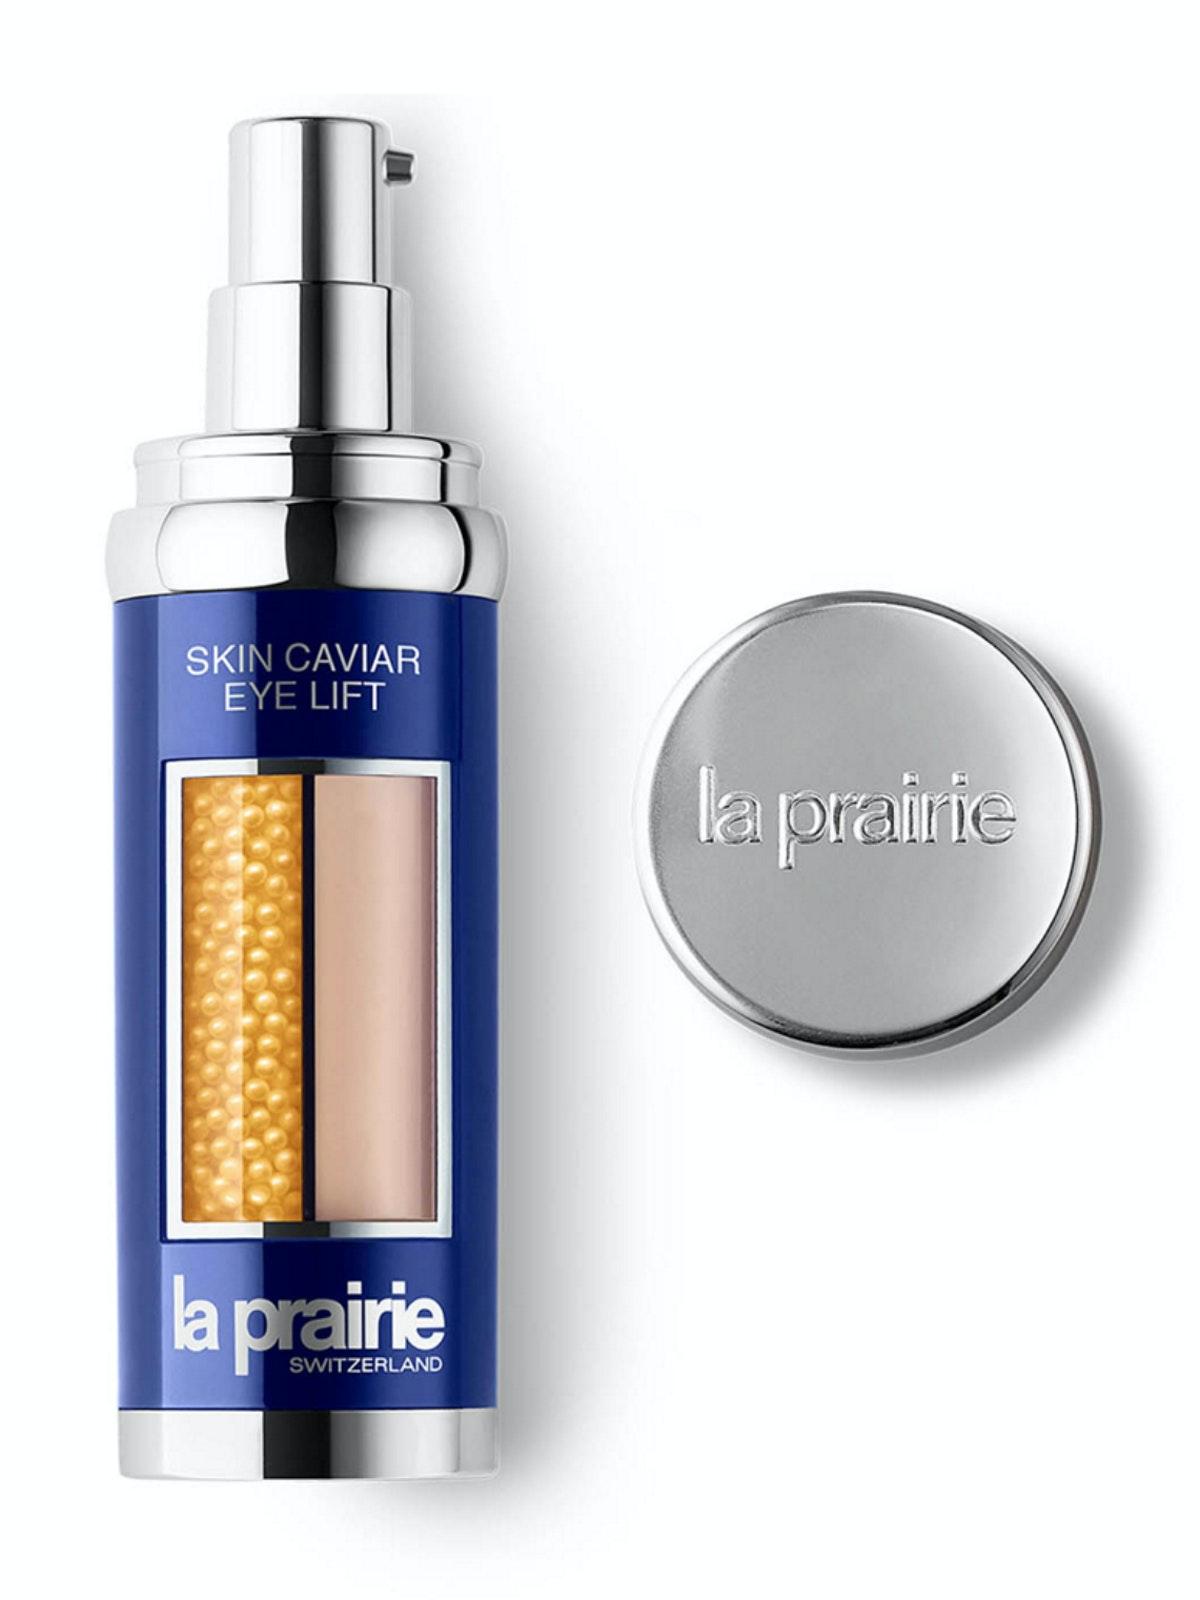 La Prairie Skin Caviar Eye Lift Serum